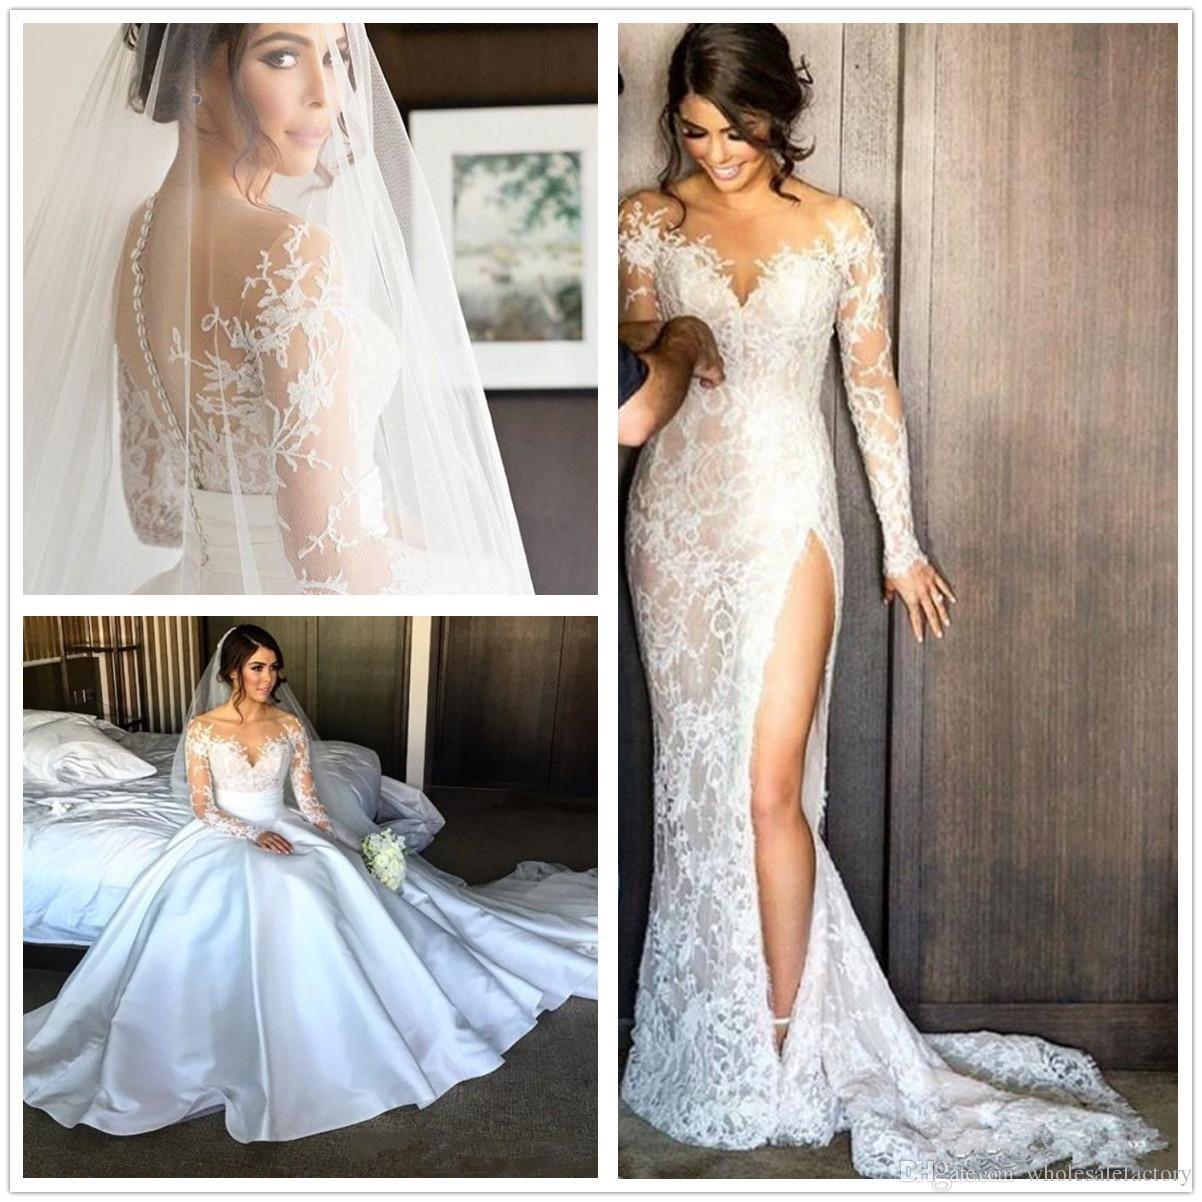 Elegant Illusion Long Sleeves Lace Split Mermaid Wedding Dresses Jewel Neck Satin Detachab Ball Gown Wedding Dress Jeweled Wedding Dress Pretty Wedding Dresses [ 1202 x 1202 Pixel ]